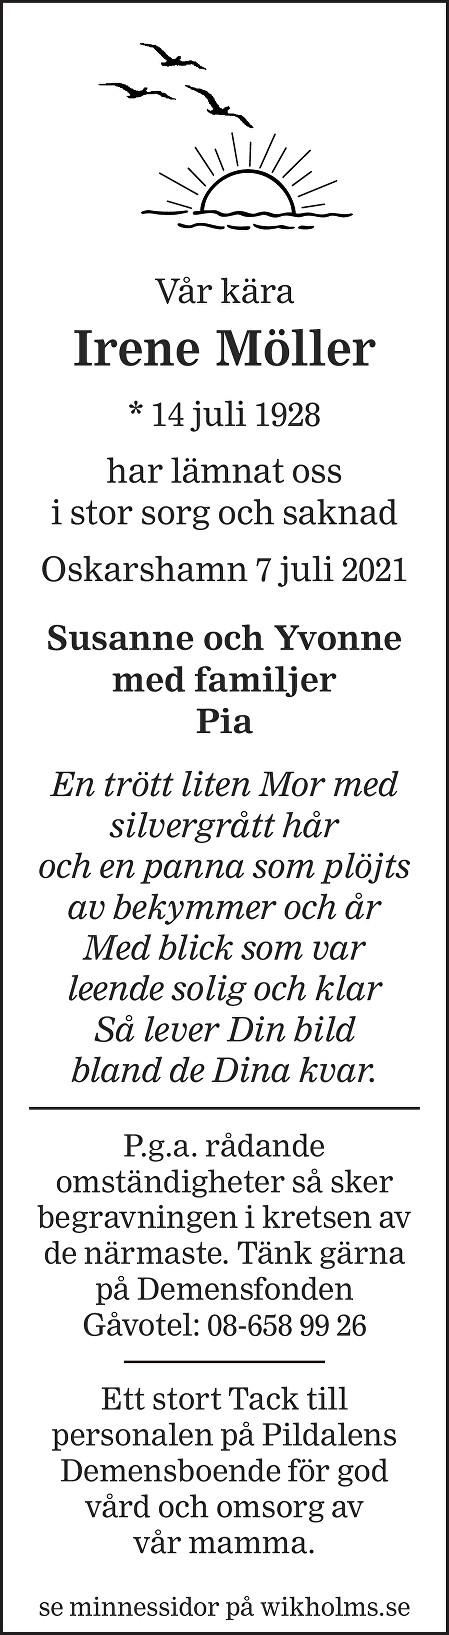 Irene Möller Death notice